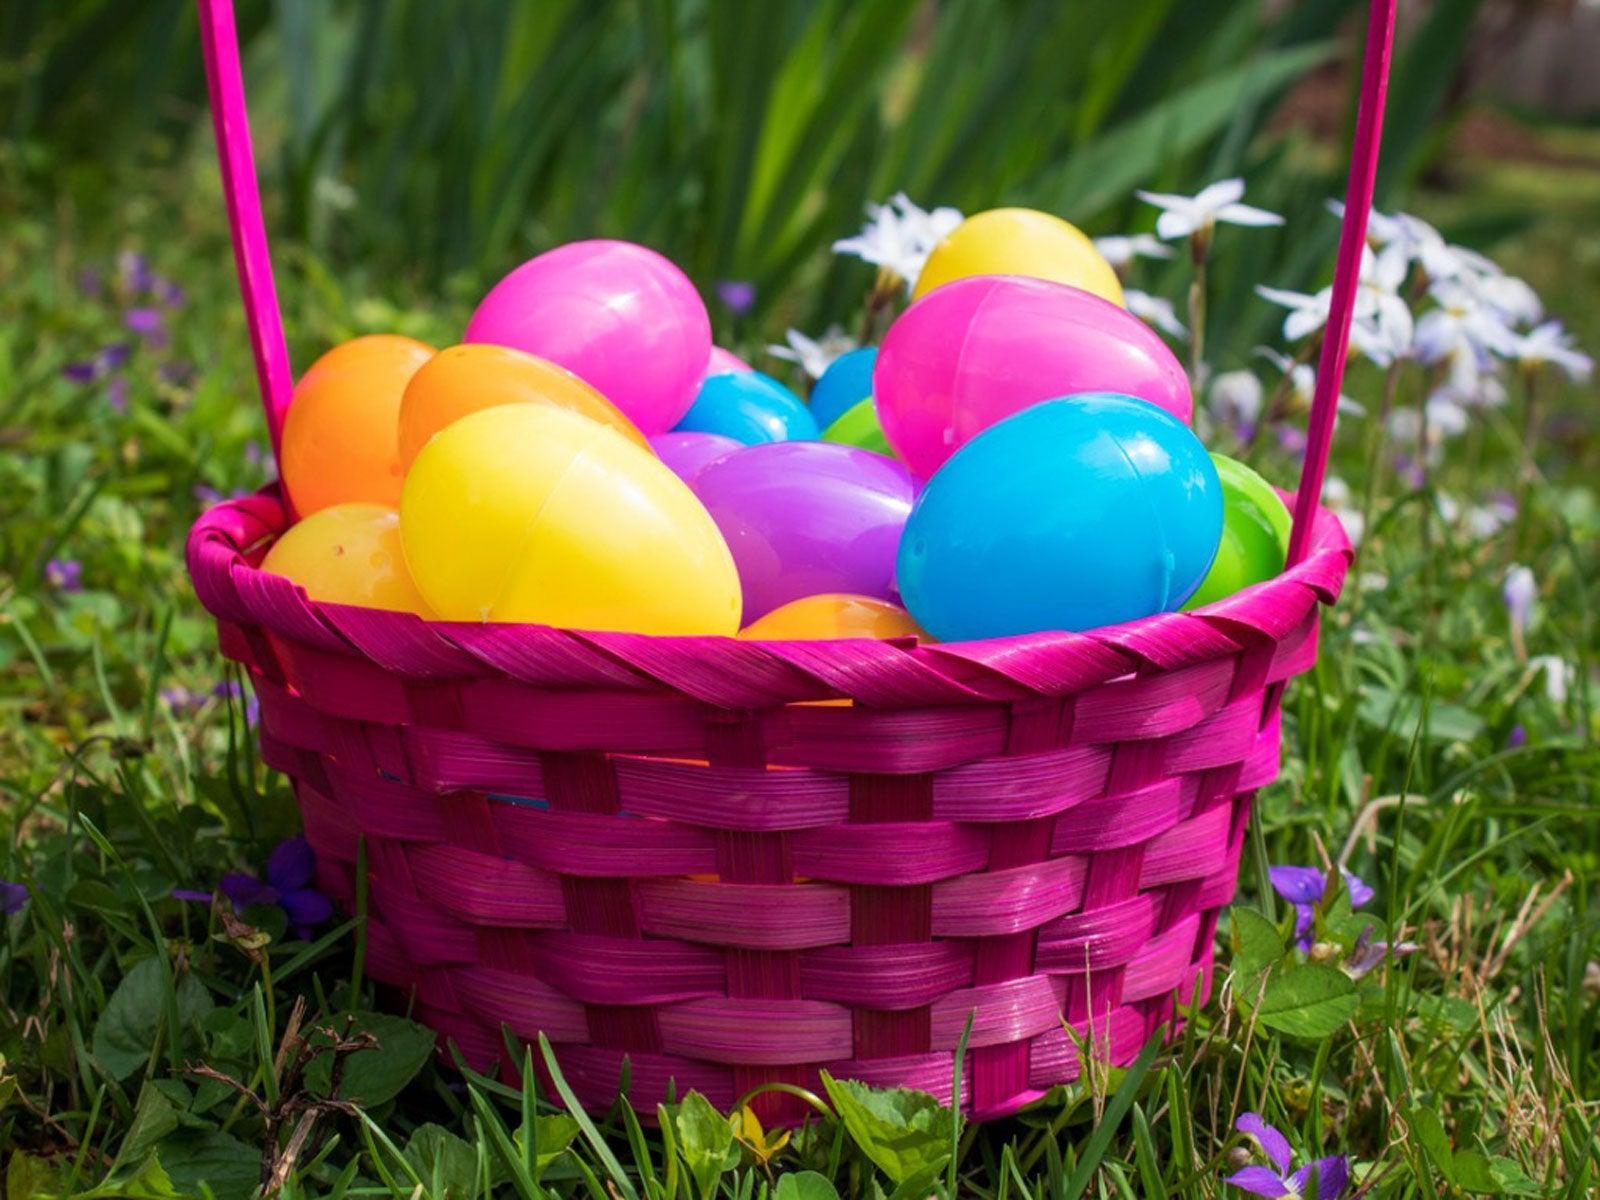 Reusing Plastic Easter Eggs Upcycle Easter Eggs In The Garden